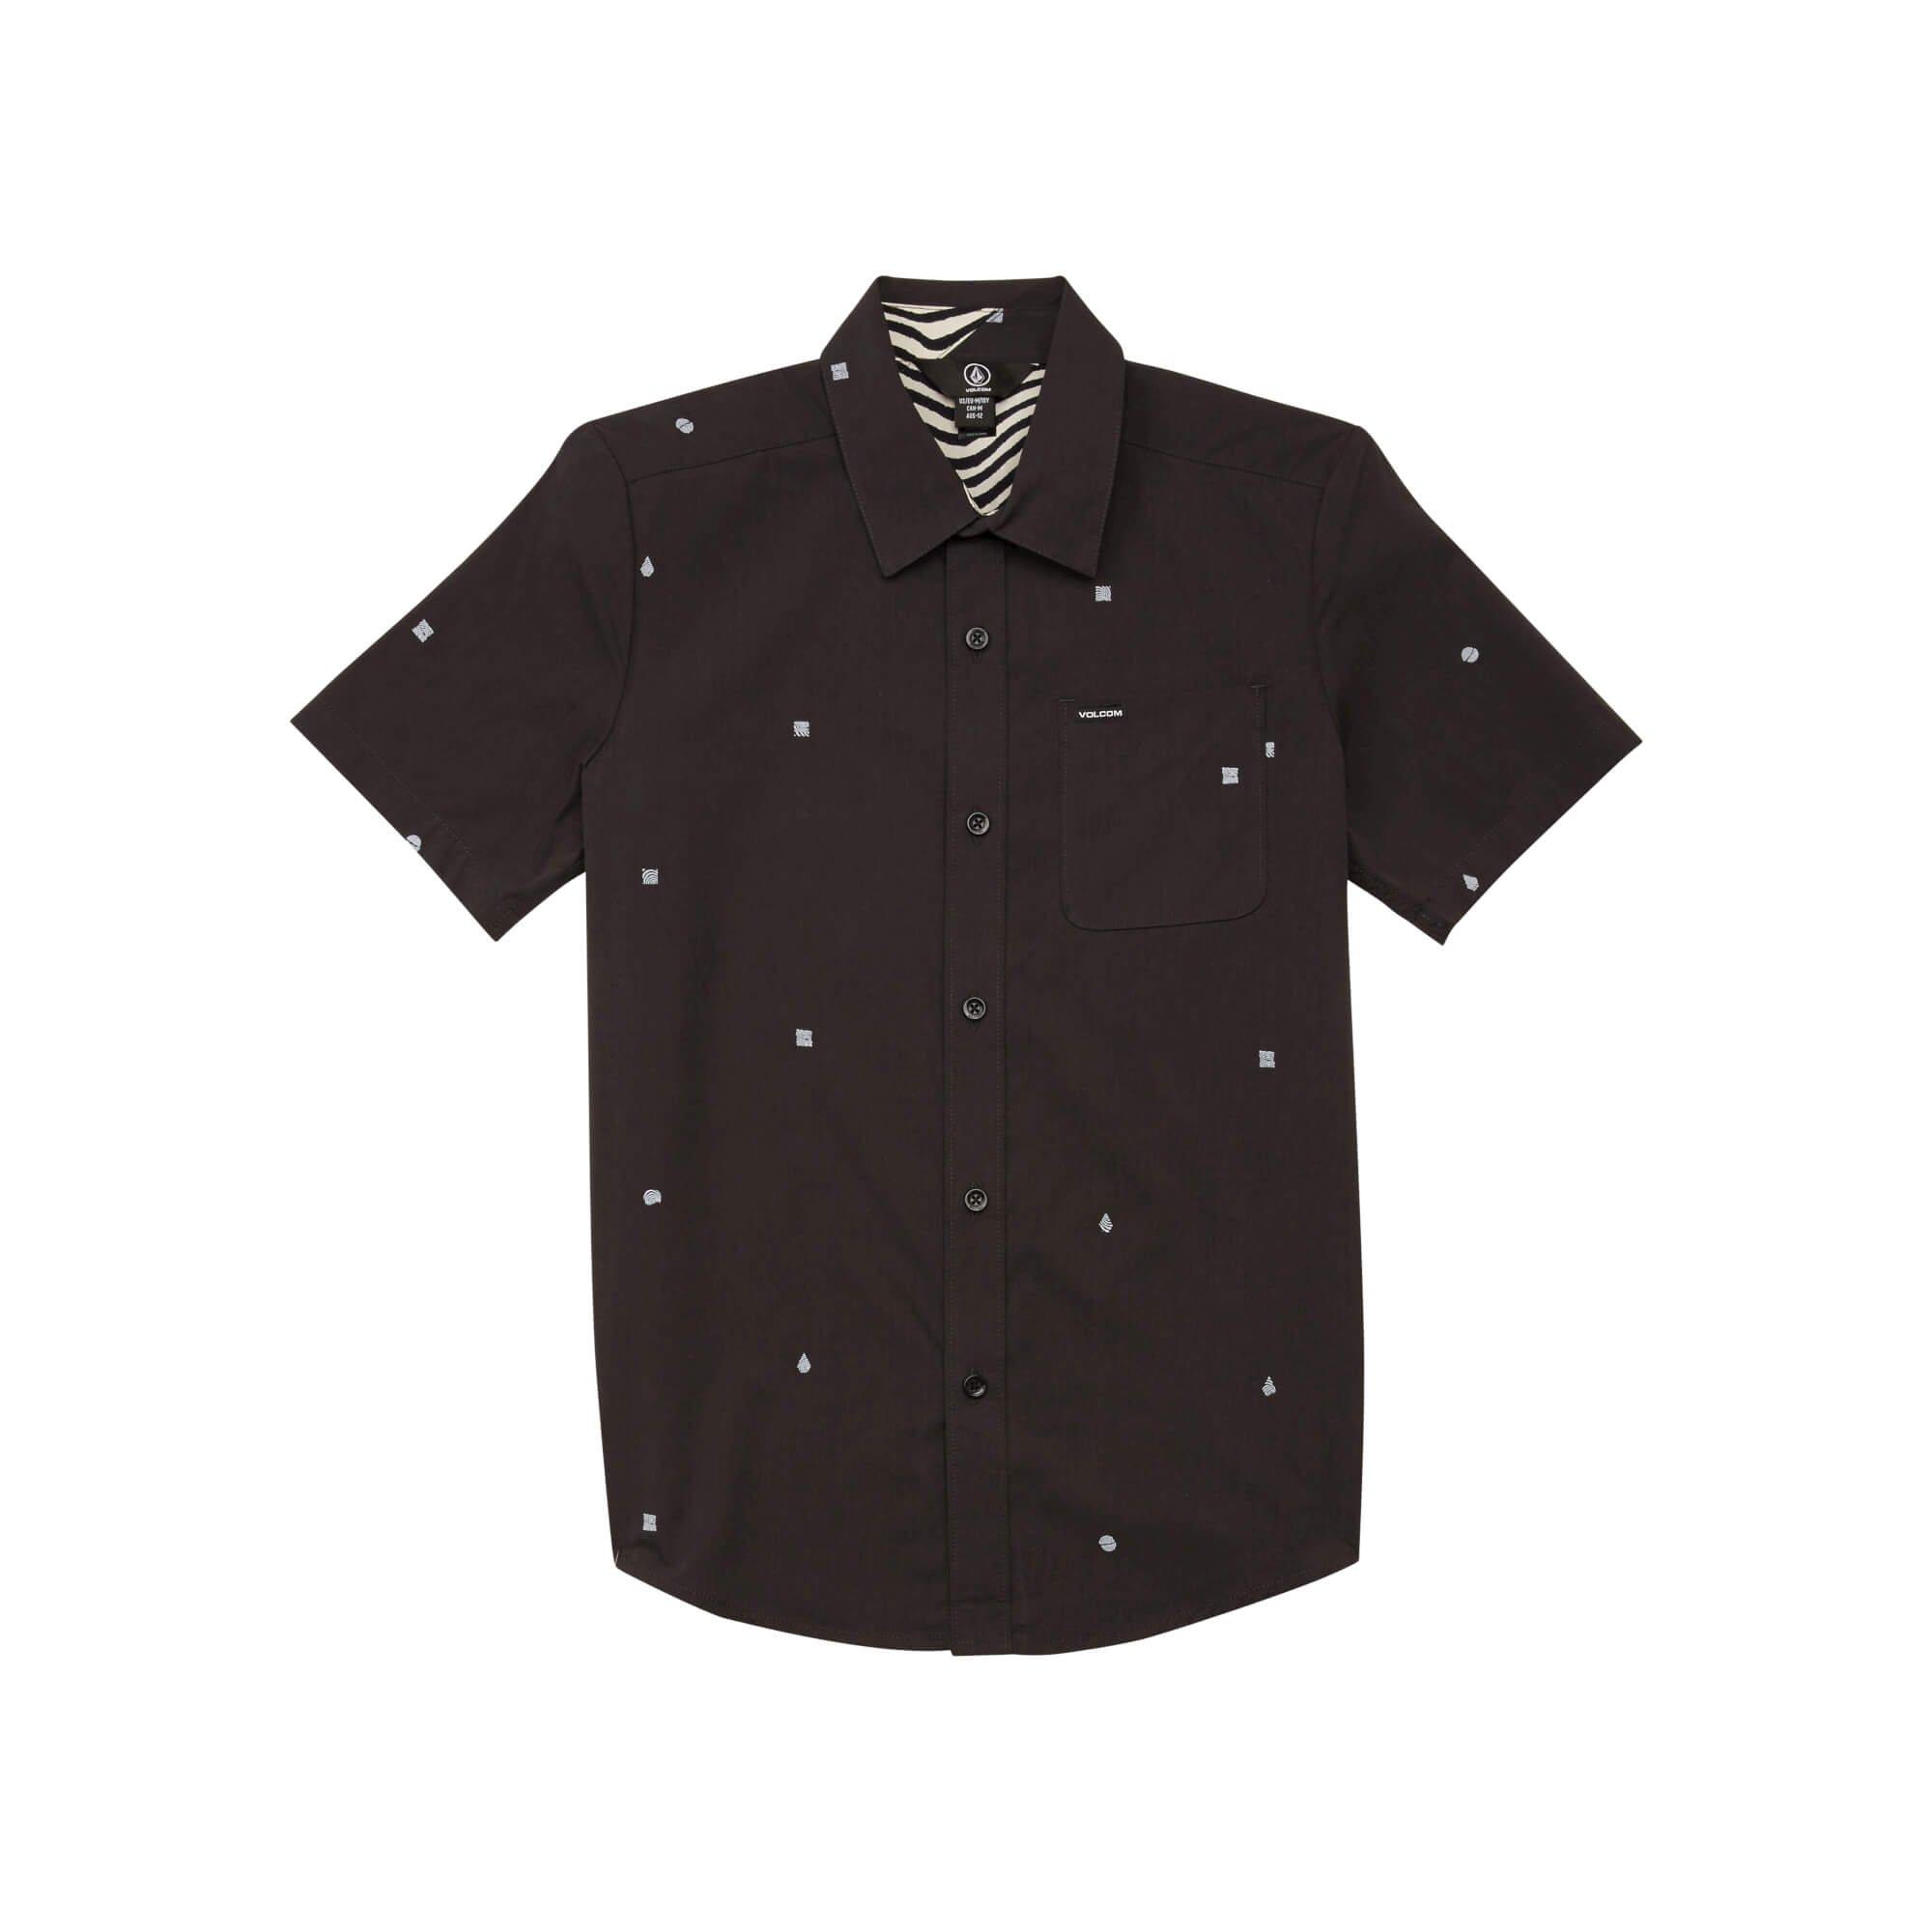 Volcom Boys' Big DRAGSTONE Button UP Woven Short Sleeve Shirt, Asphalt Black, Medium